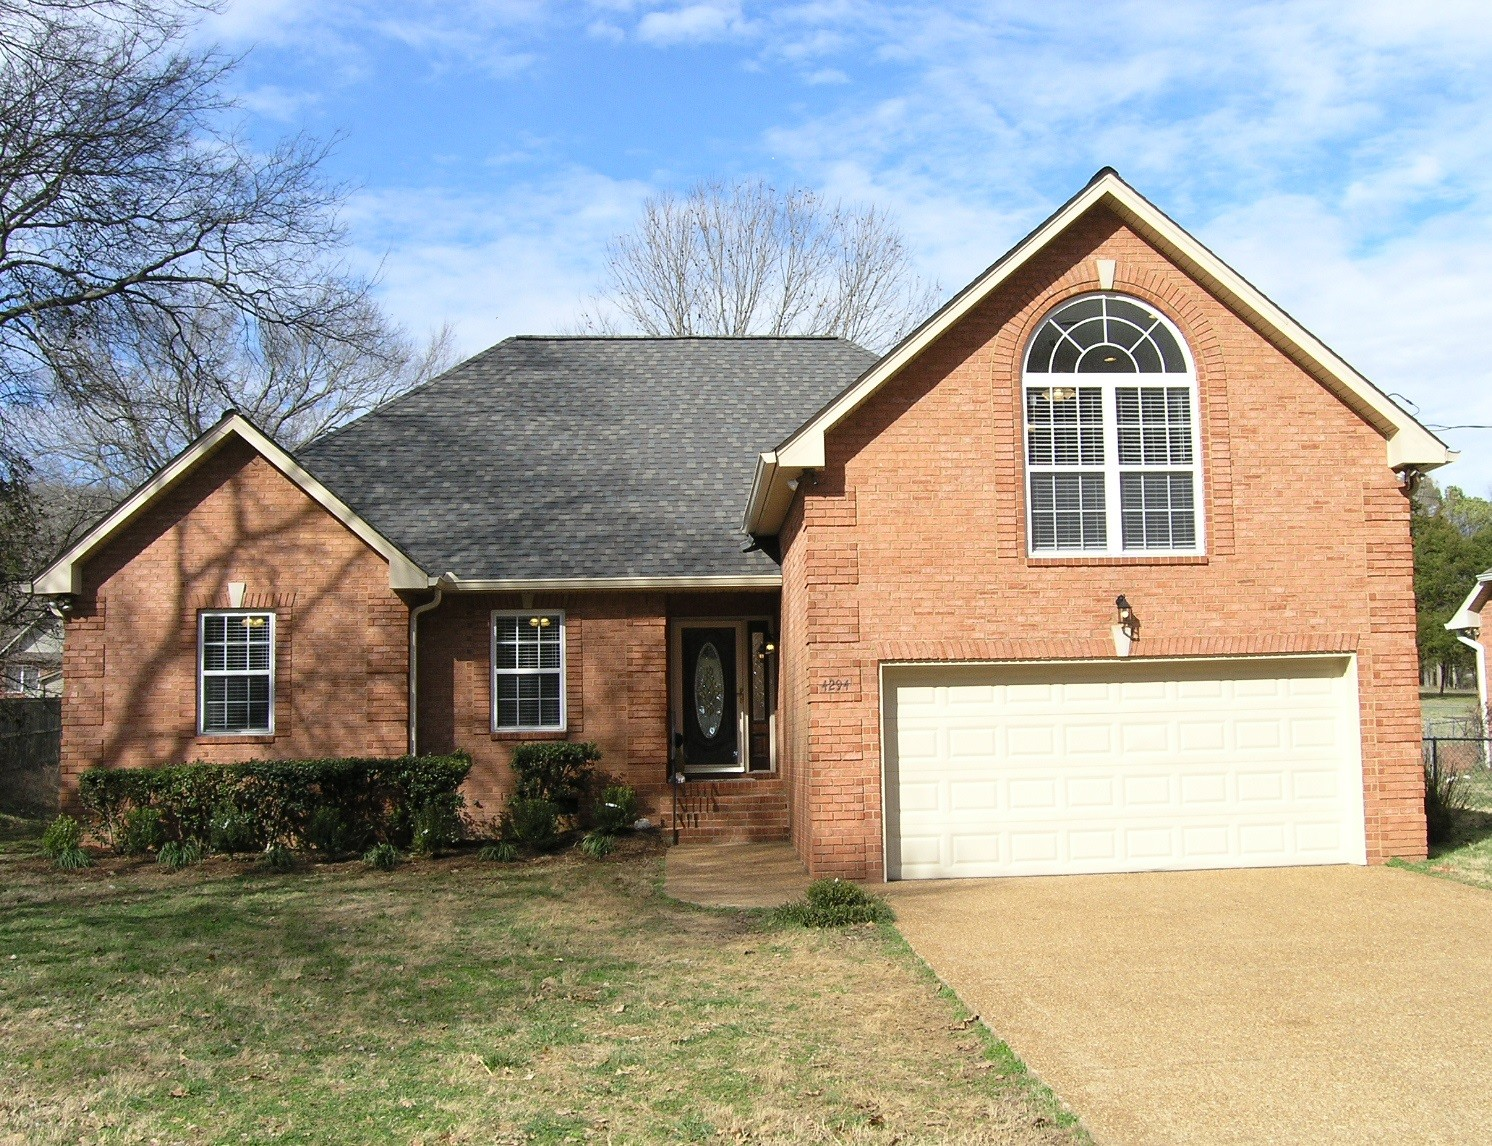 4294 Brick Church Pike, Whites Creek, TN 37189 - Whites Creek, TN real estate listing